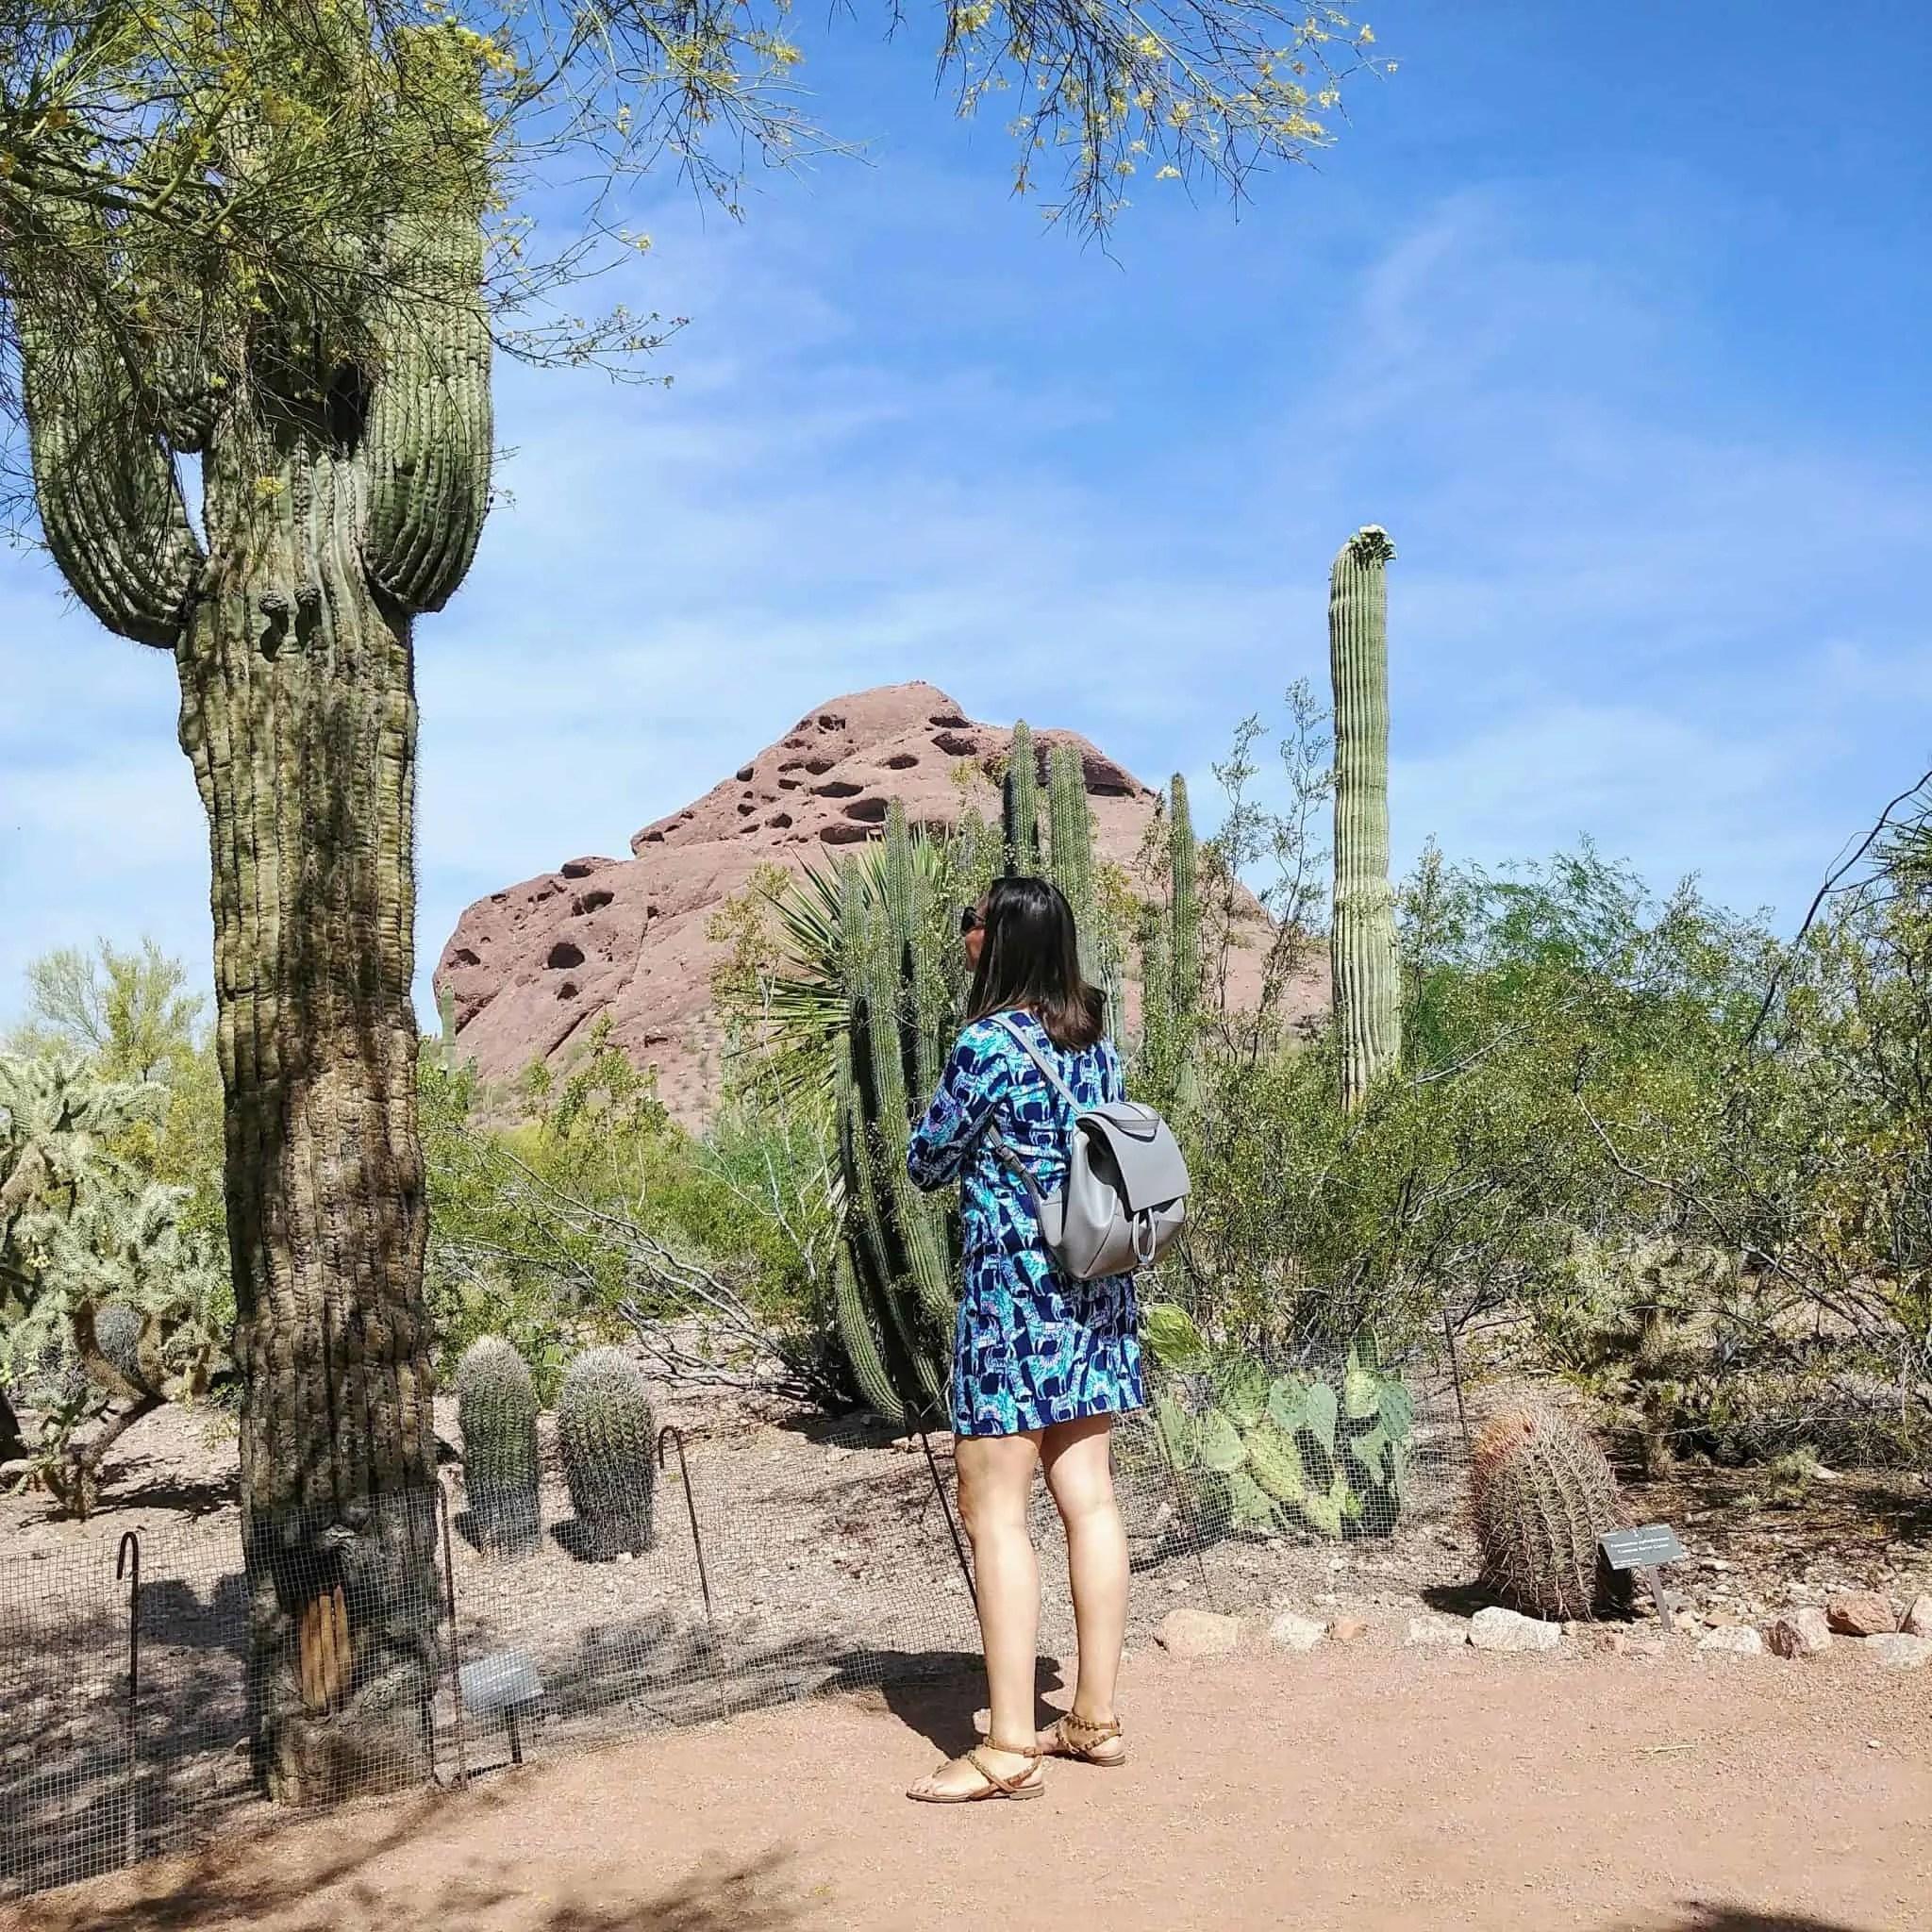 Botanical Gardens Arizona butte cactus mountain views